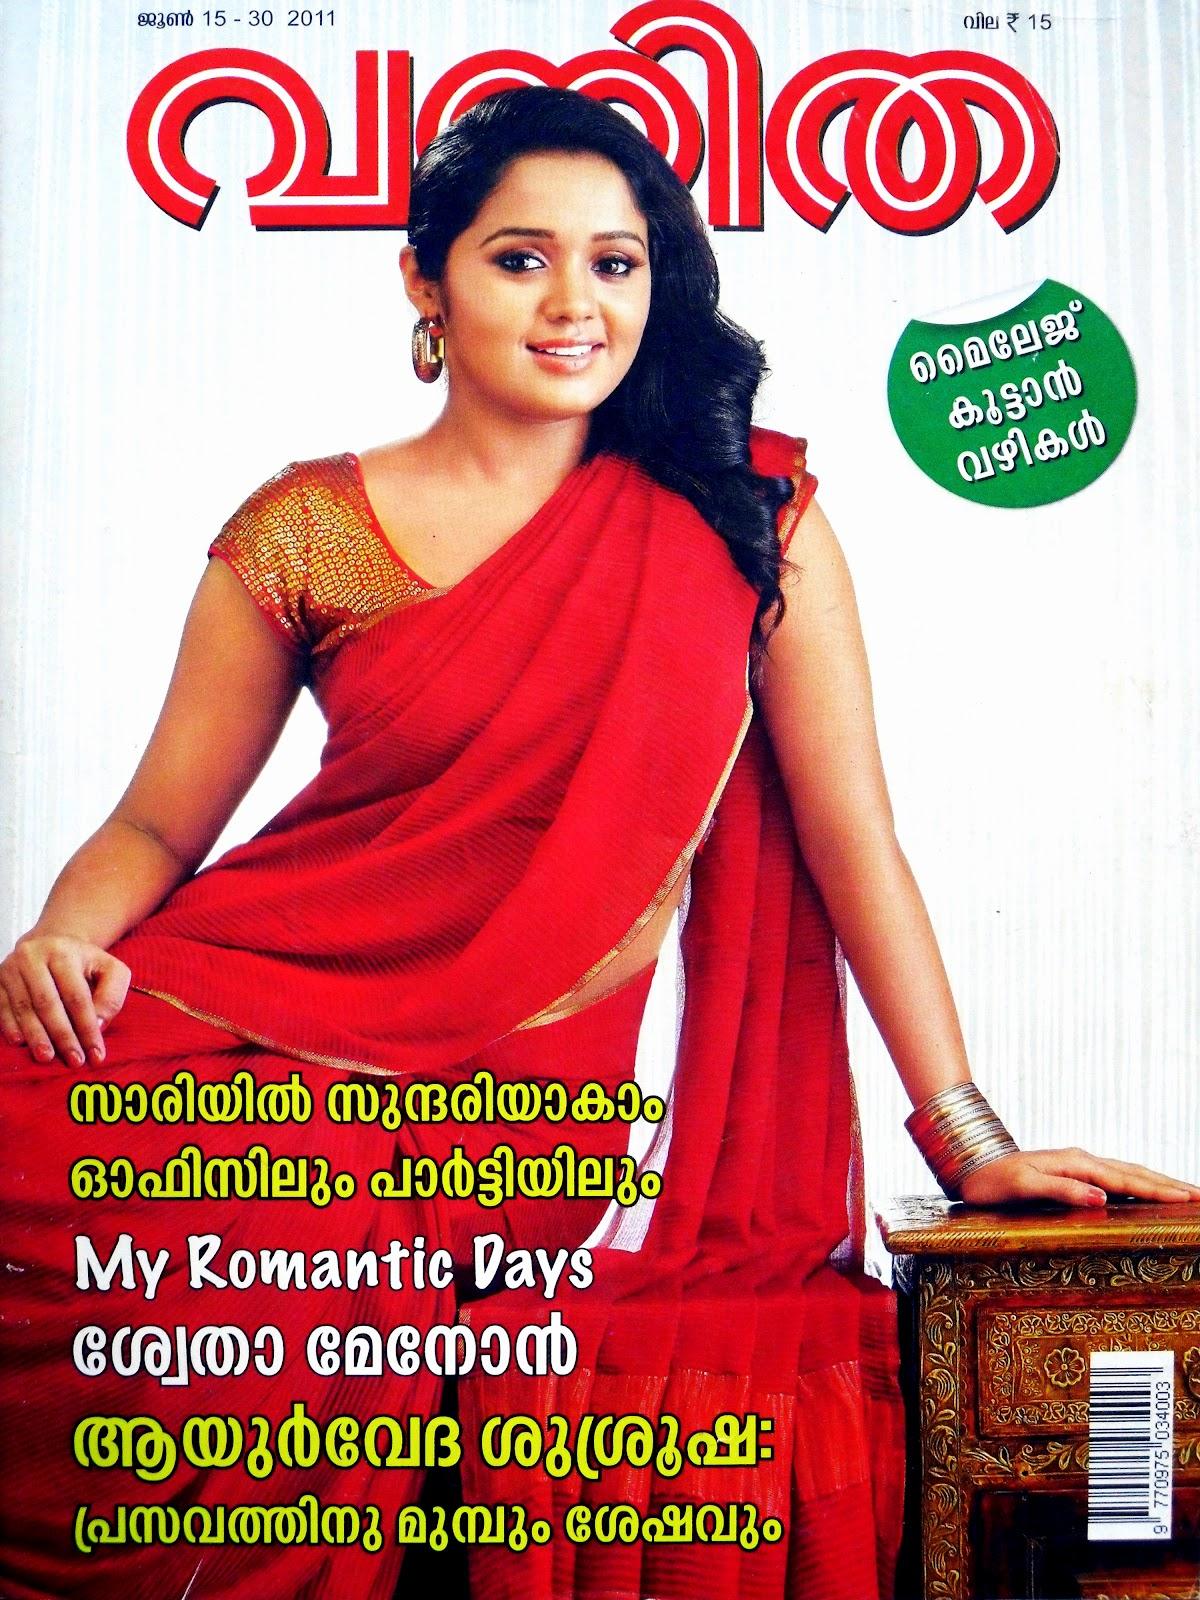 Spicy Magazine Covers